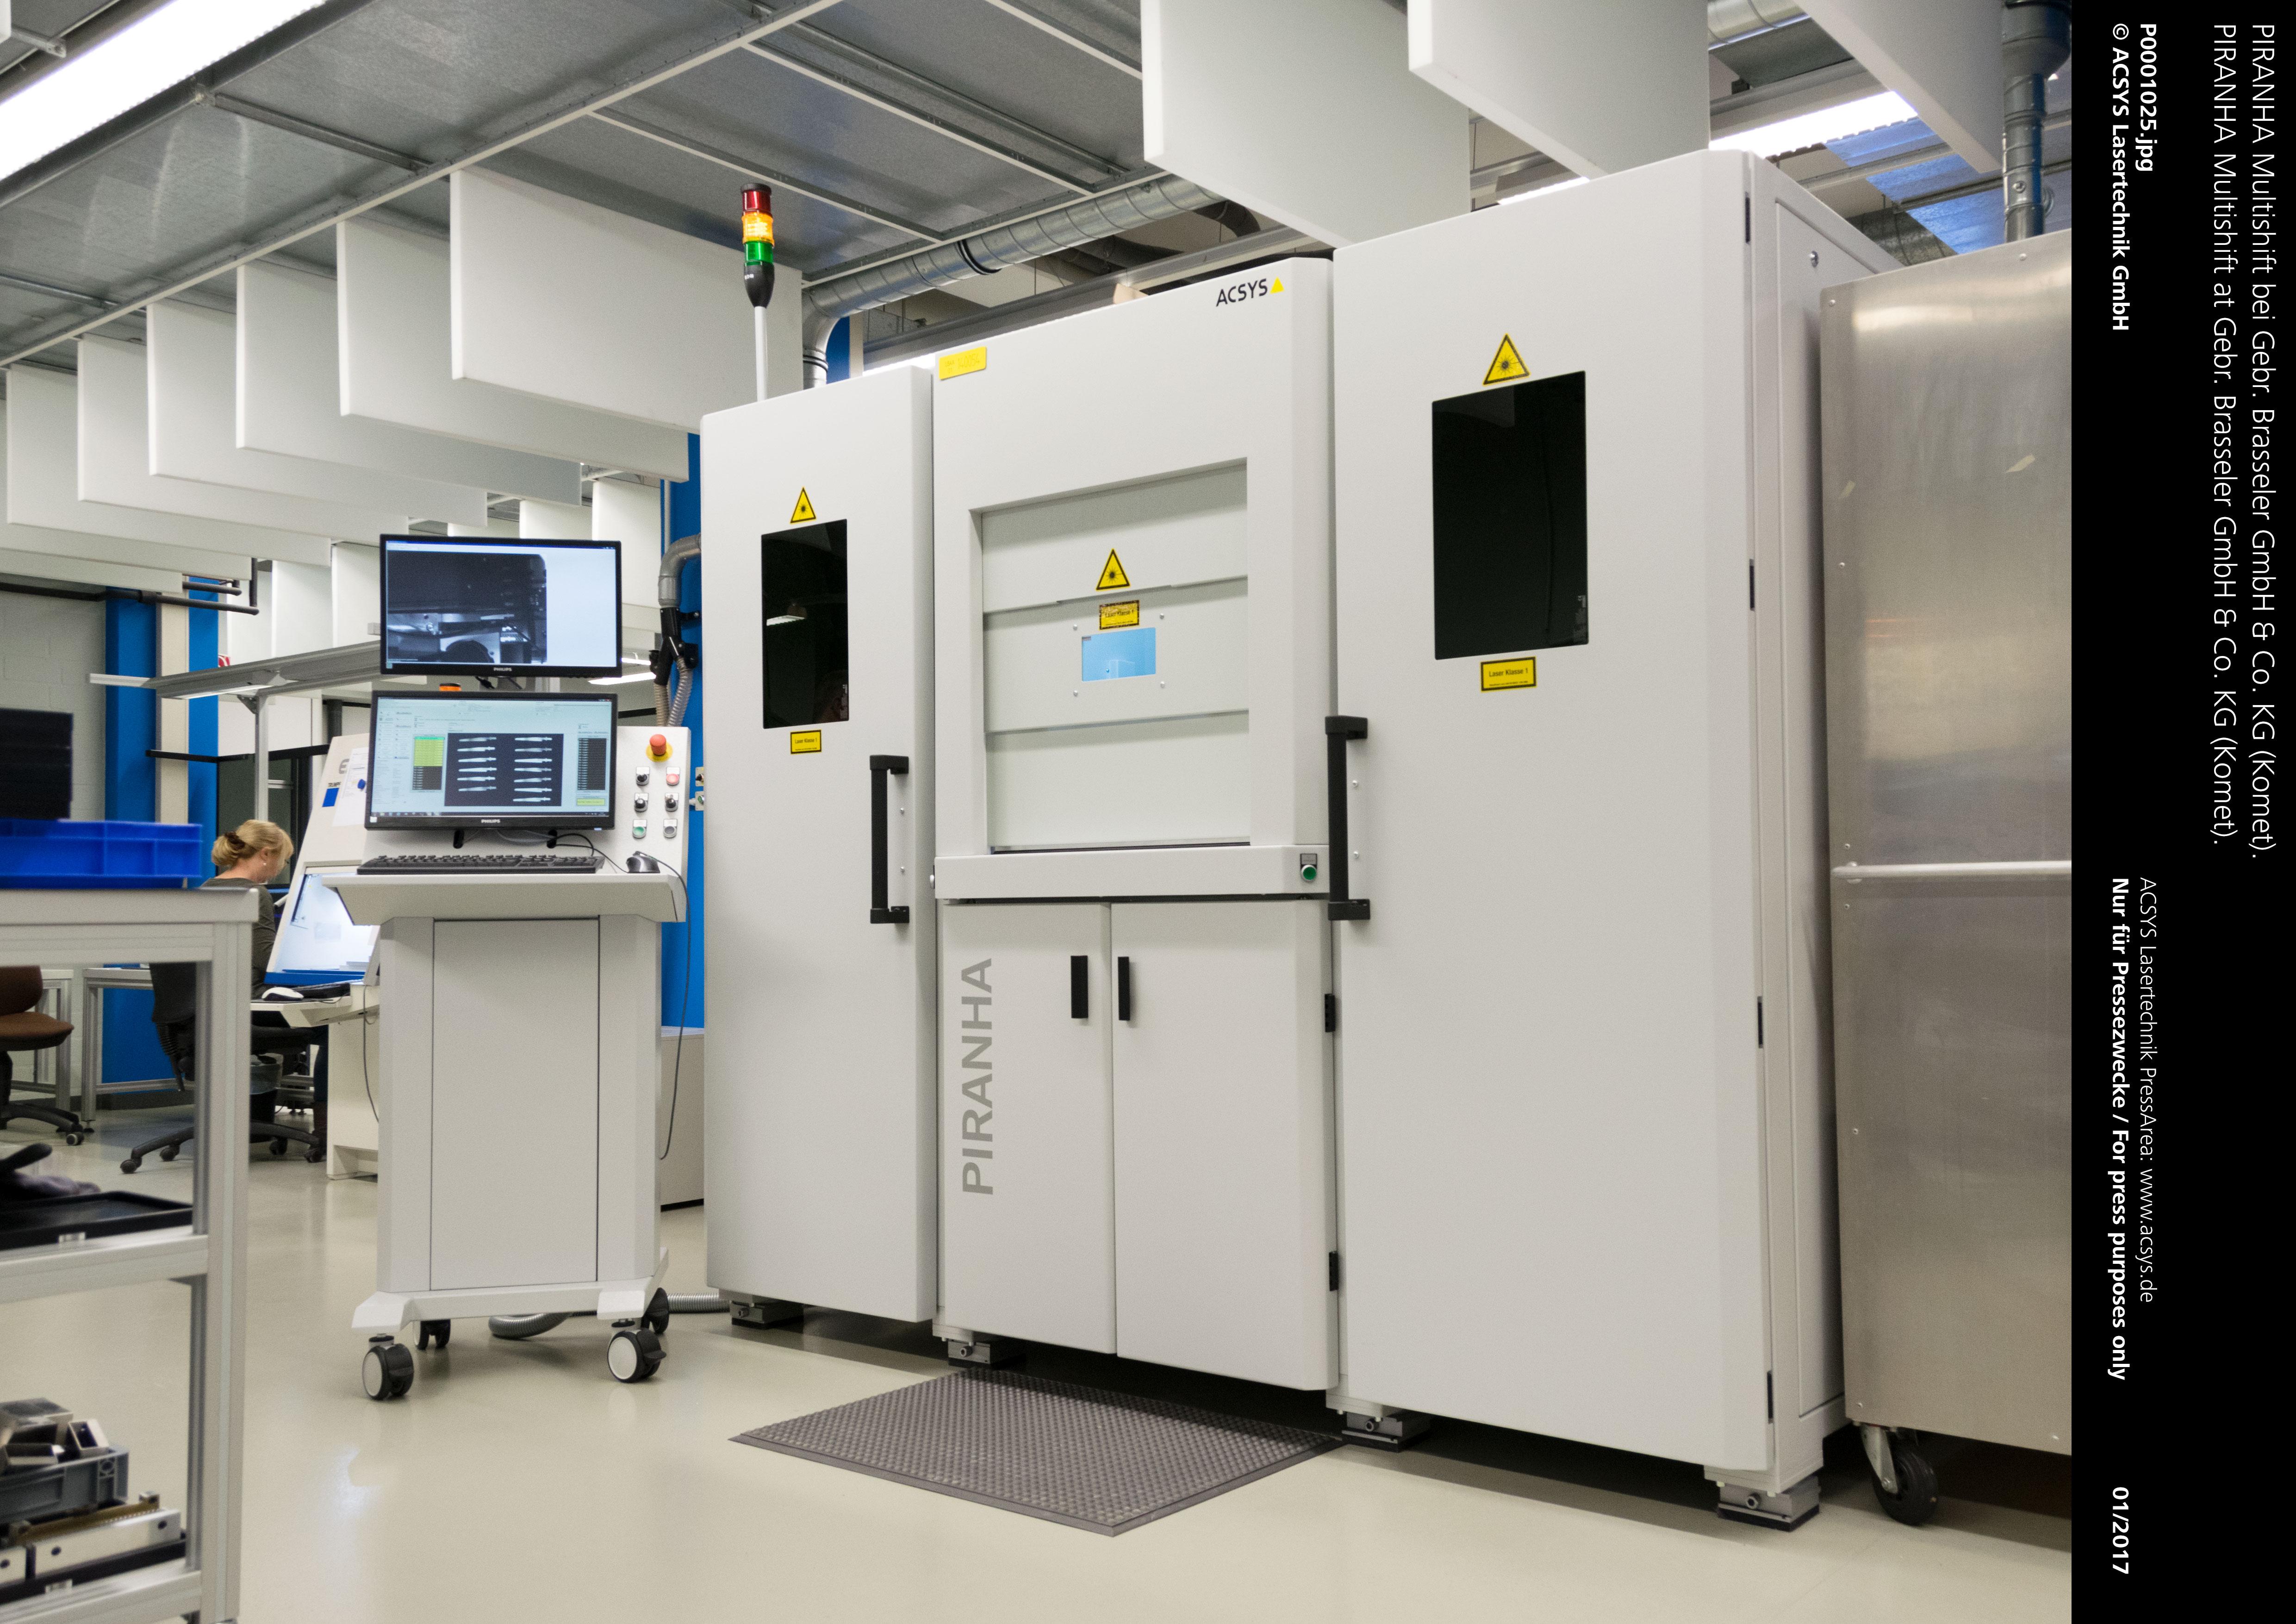 PIRANHA Multishift bei Gebr. Brasseler GmbH & Co. KG (Komet).